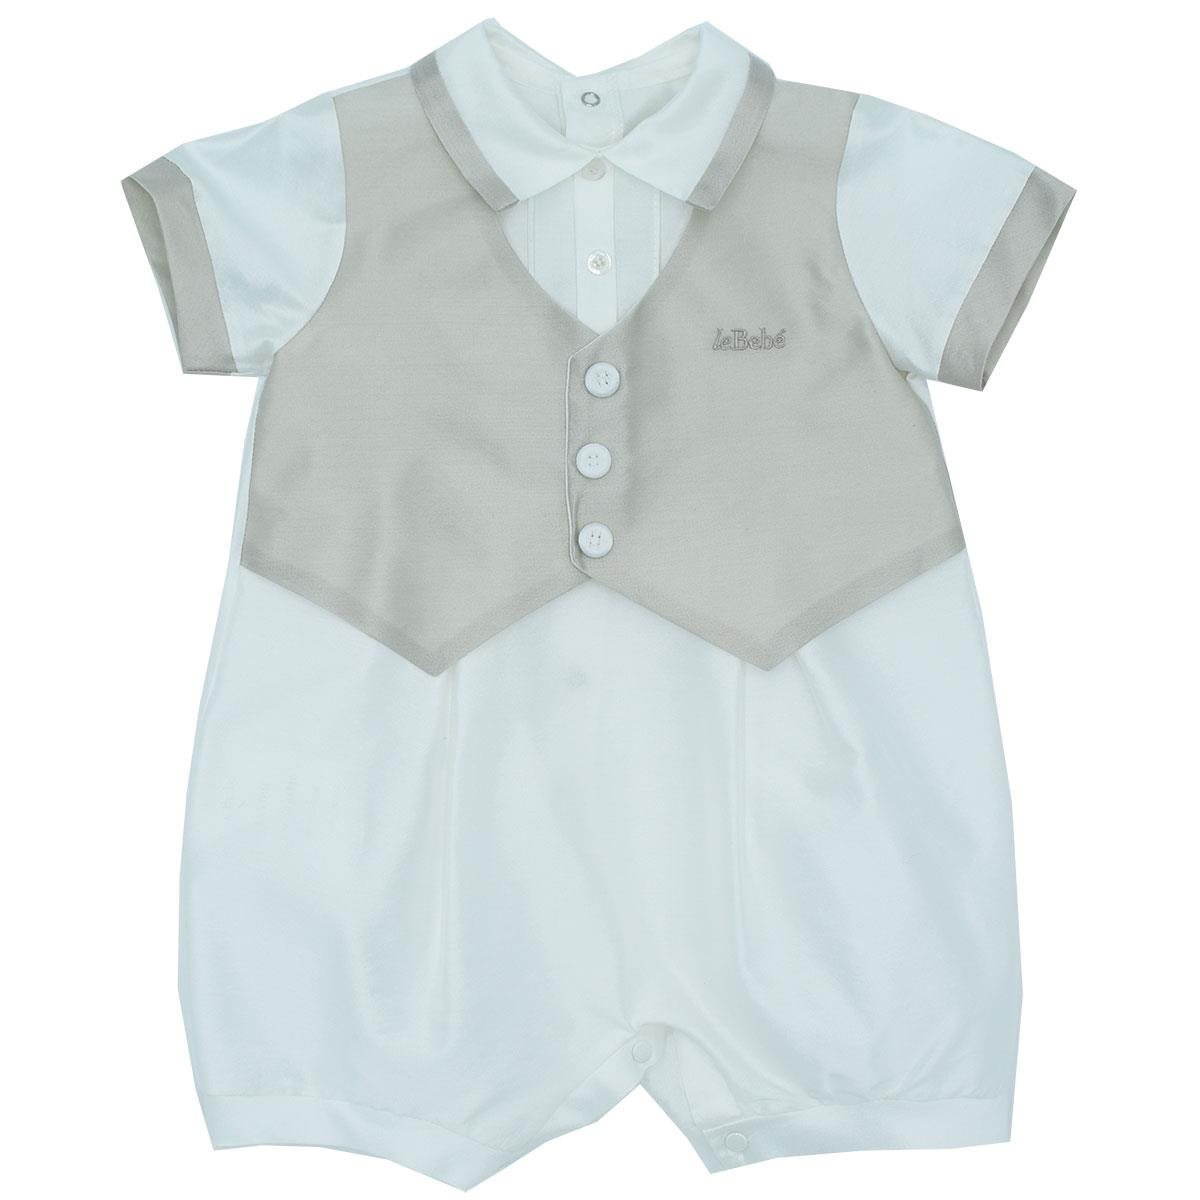 ec4249d565 Le Bebè Neonato Pagliacceto Gilet Ecrù-Angelsbimbi